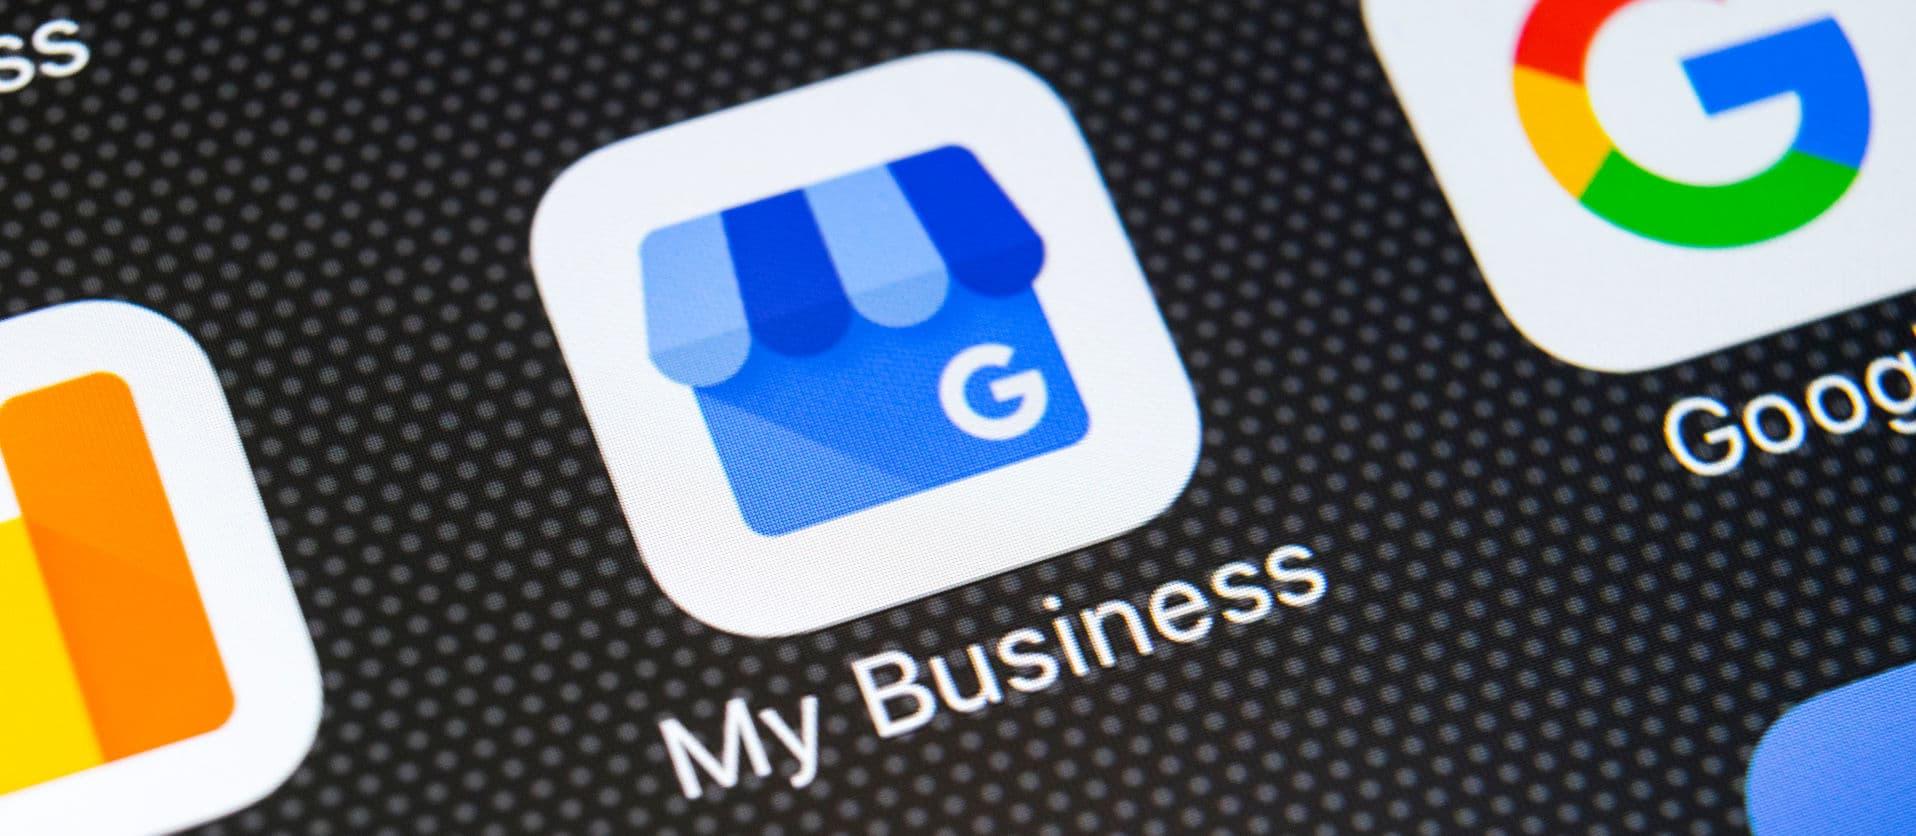 google my business vindbaarheid